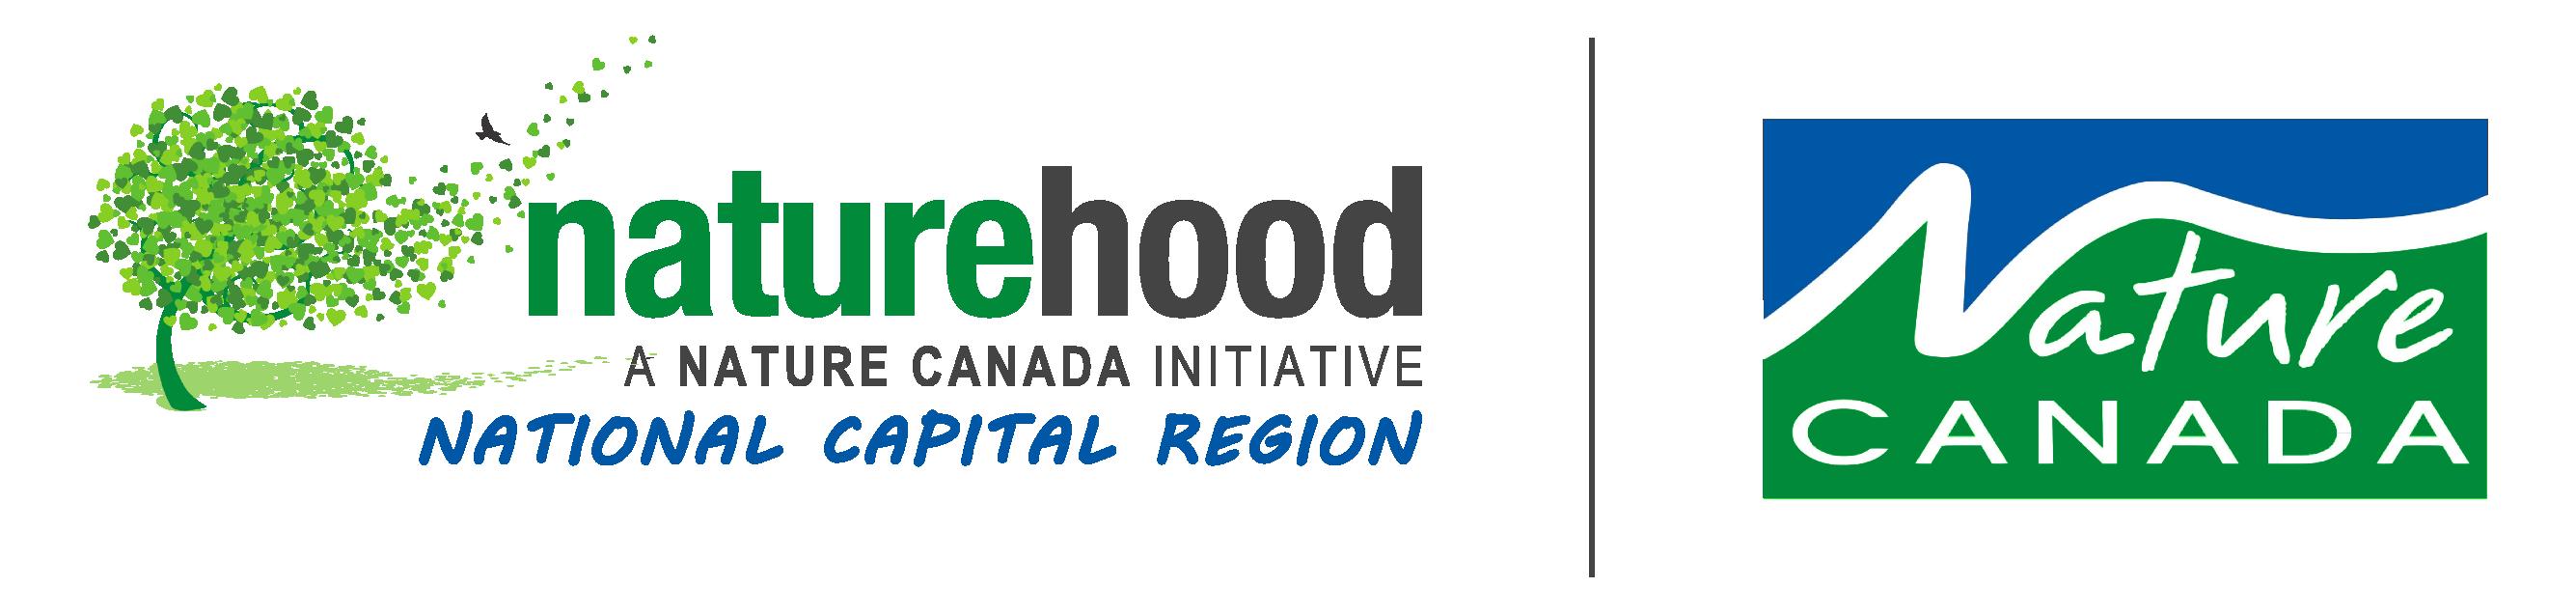 NatureHood National Capital Region - A Nature Cana